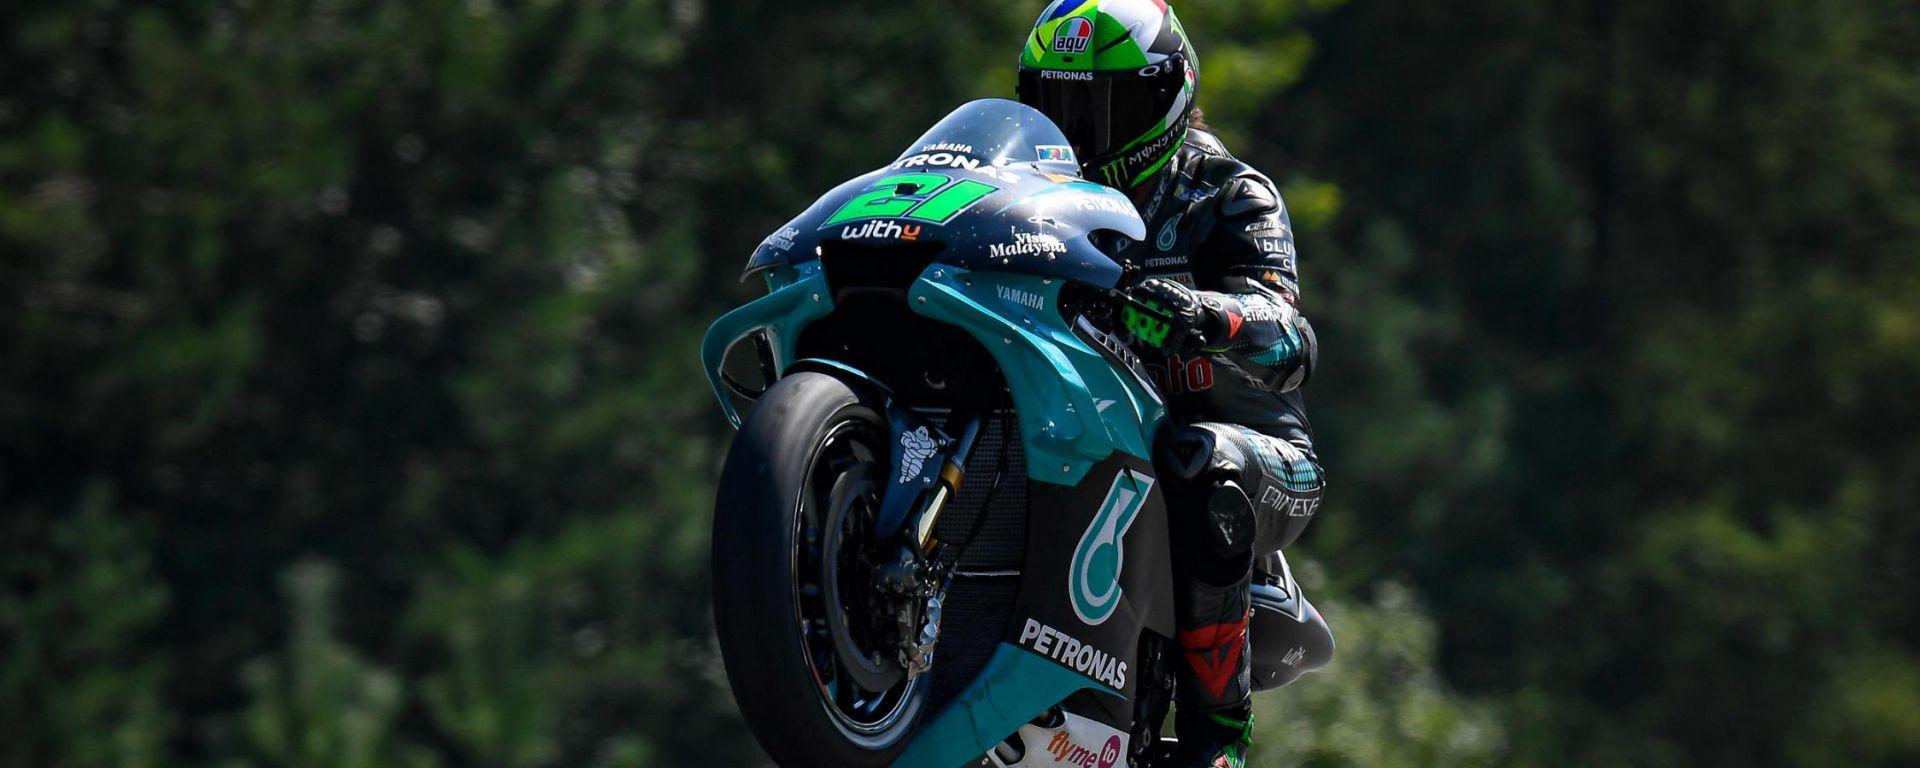 MotoGP Rep Ceca 2020, Brno: Franco Morbidelli (Yamaha)